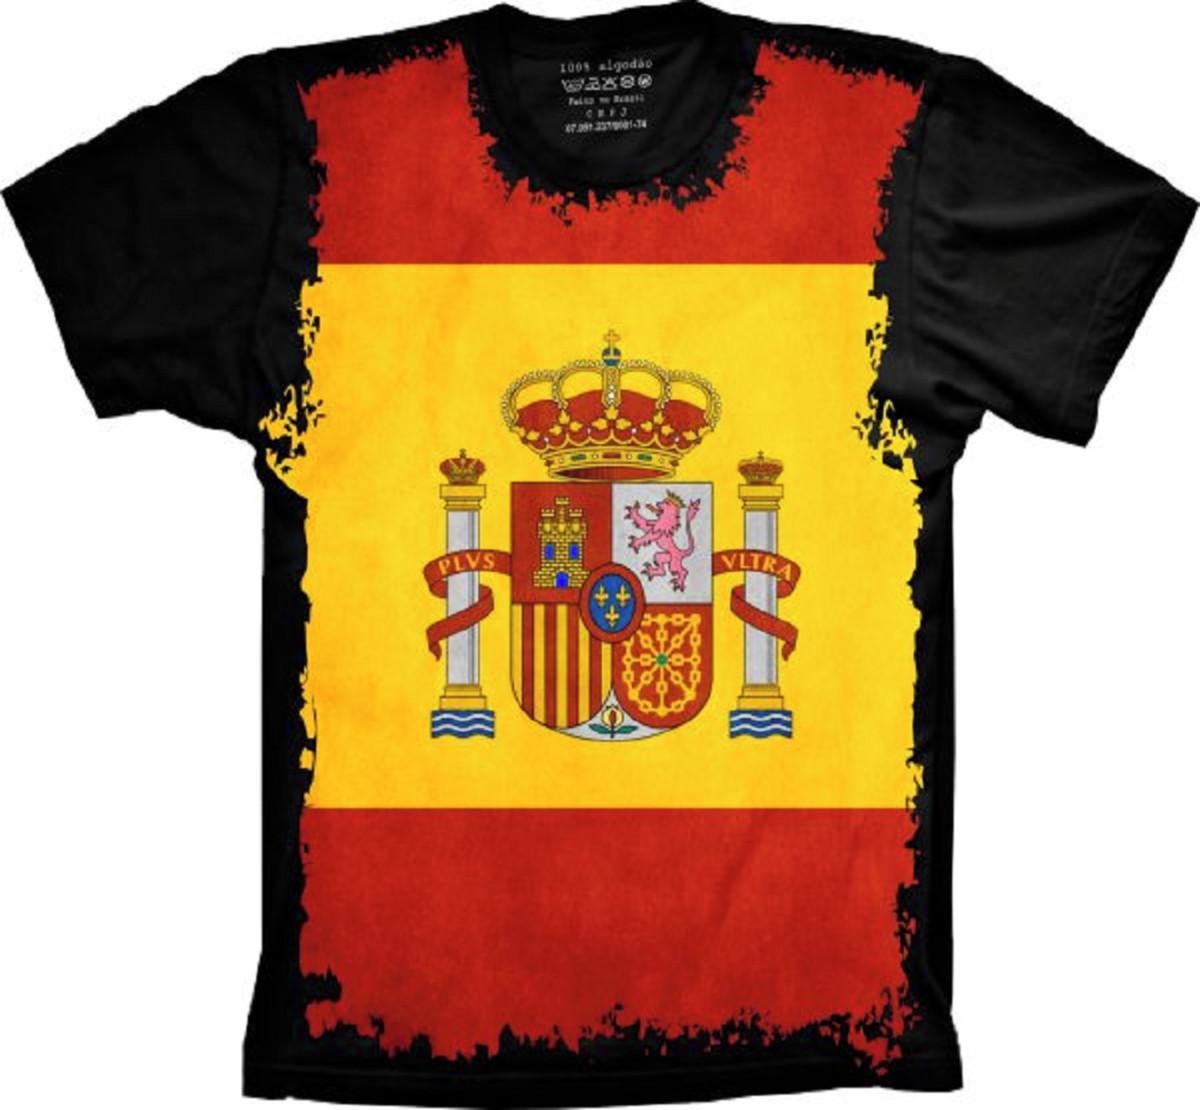 Camiseta Bandeira Espanha S-46 no Elo7  d6899619adeb7